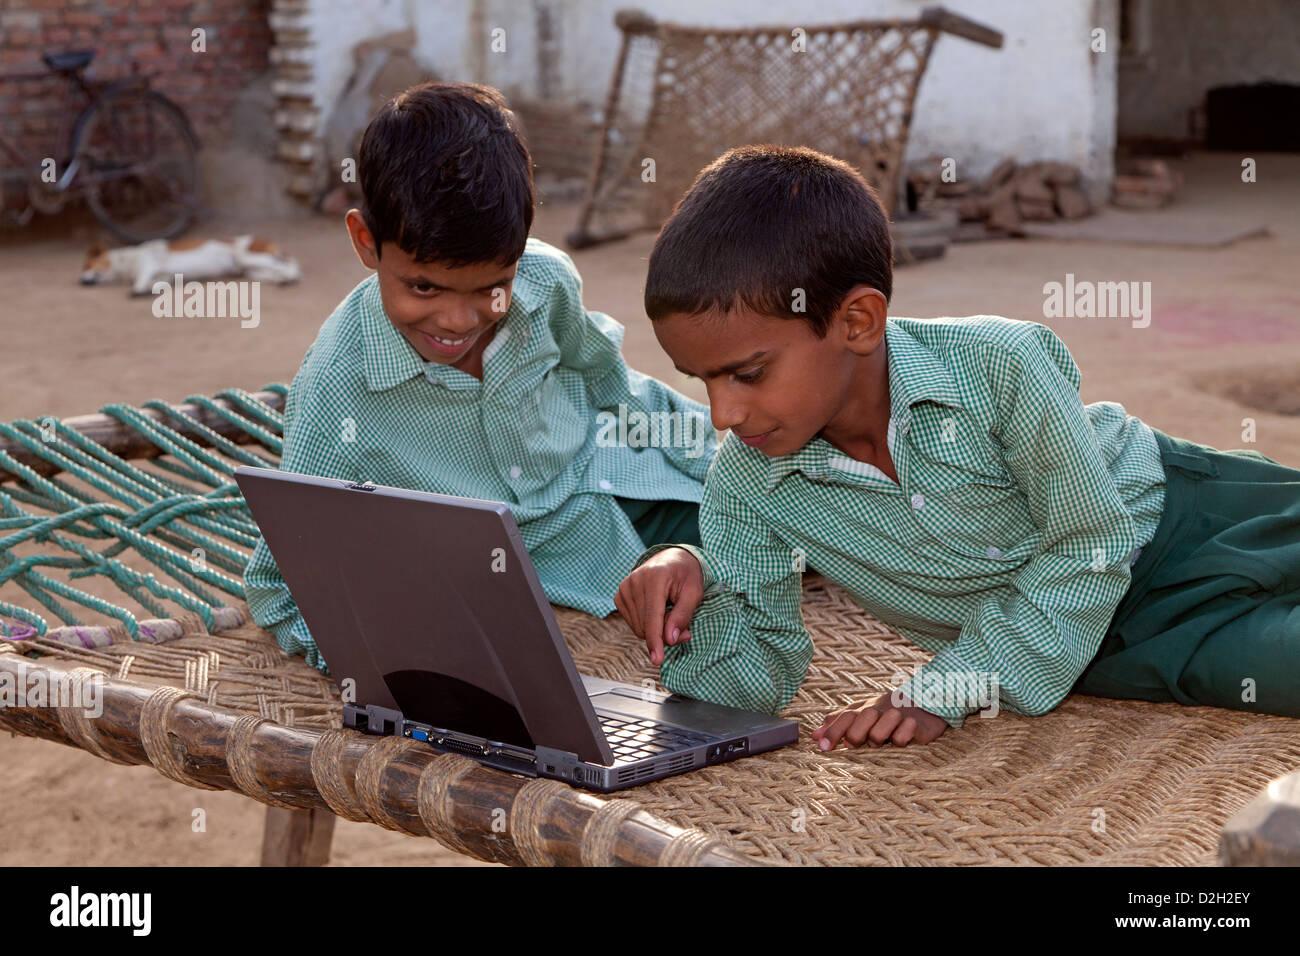 India, Uttar Pradesh, Agra, young children in school uniform looking at laptop - Stock Image